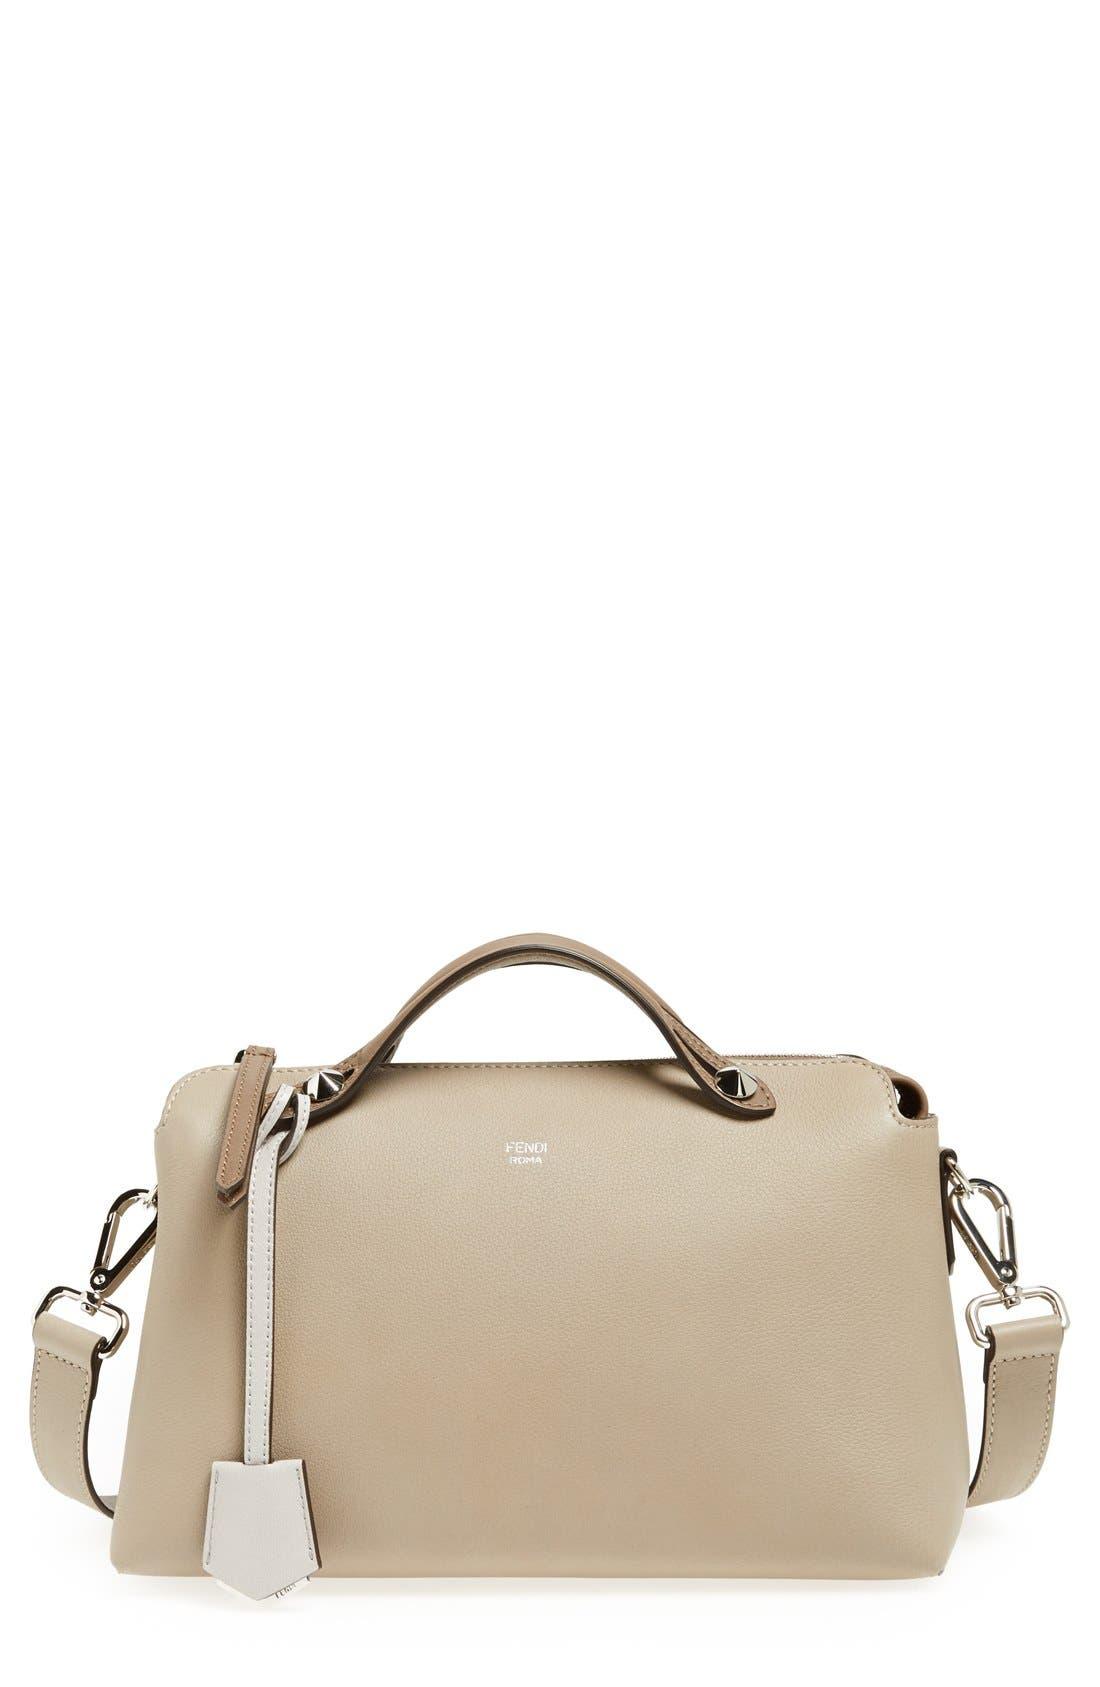 'Bauletto Piccolo' Leather Crossbody Bag,                             Main thumbnail 1, color,                             Turtledv Sepia Palladuim